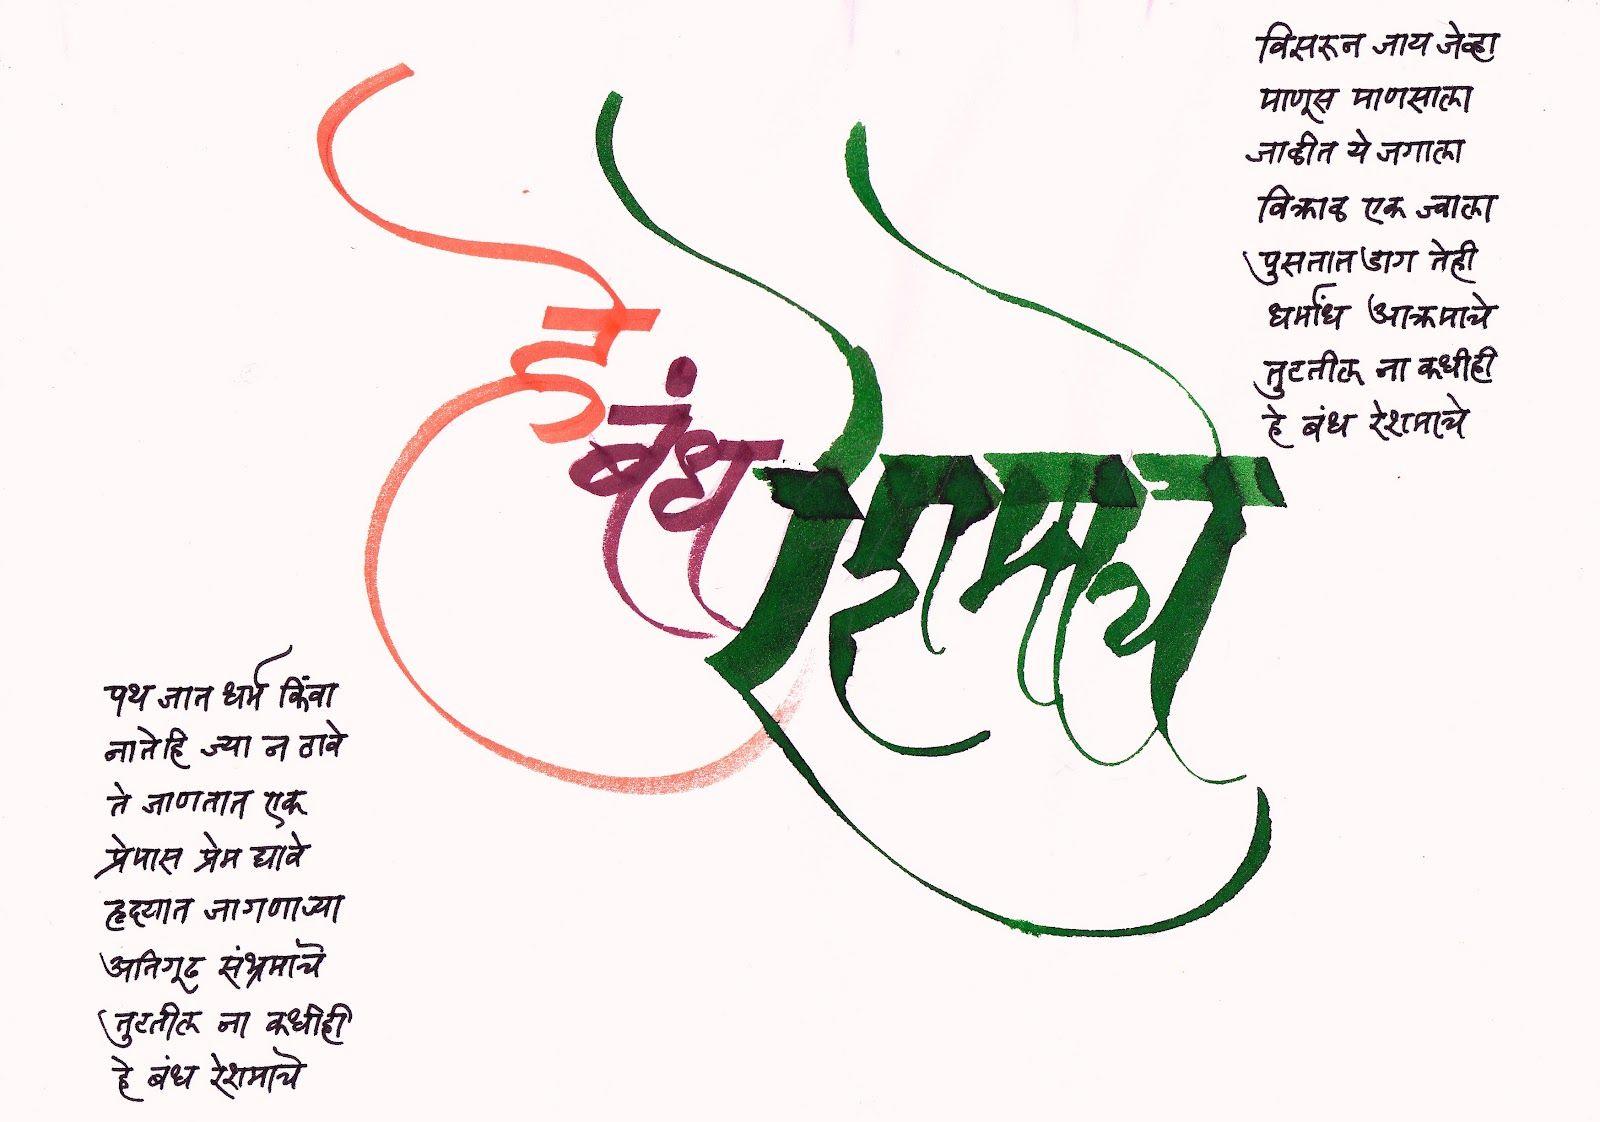 Kavayitri Shanta Shelke Marathi Poems Literature